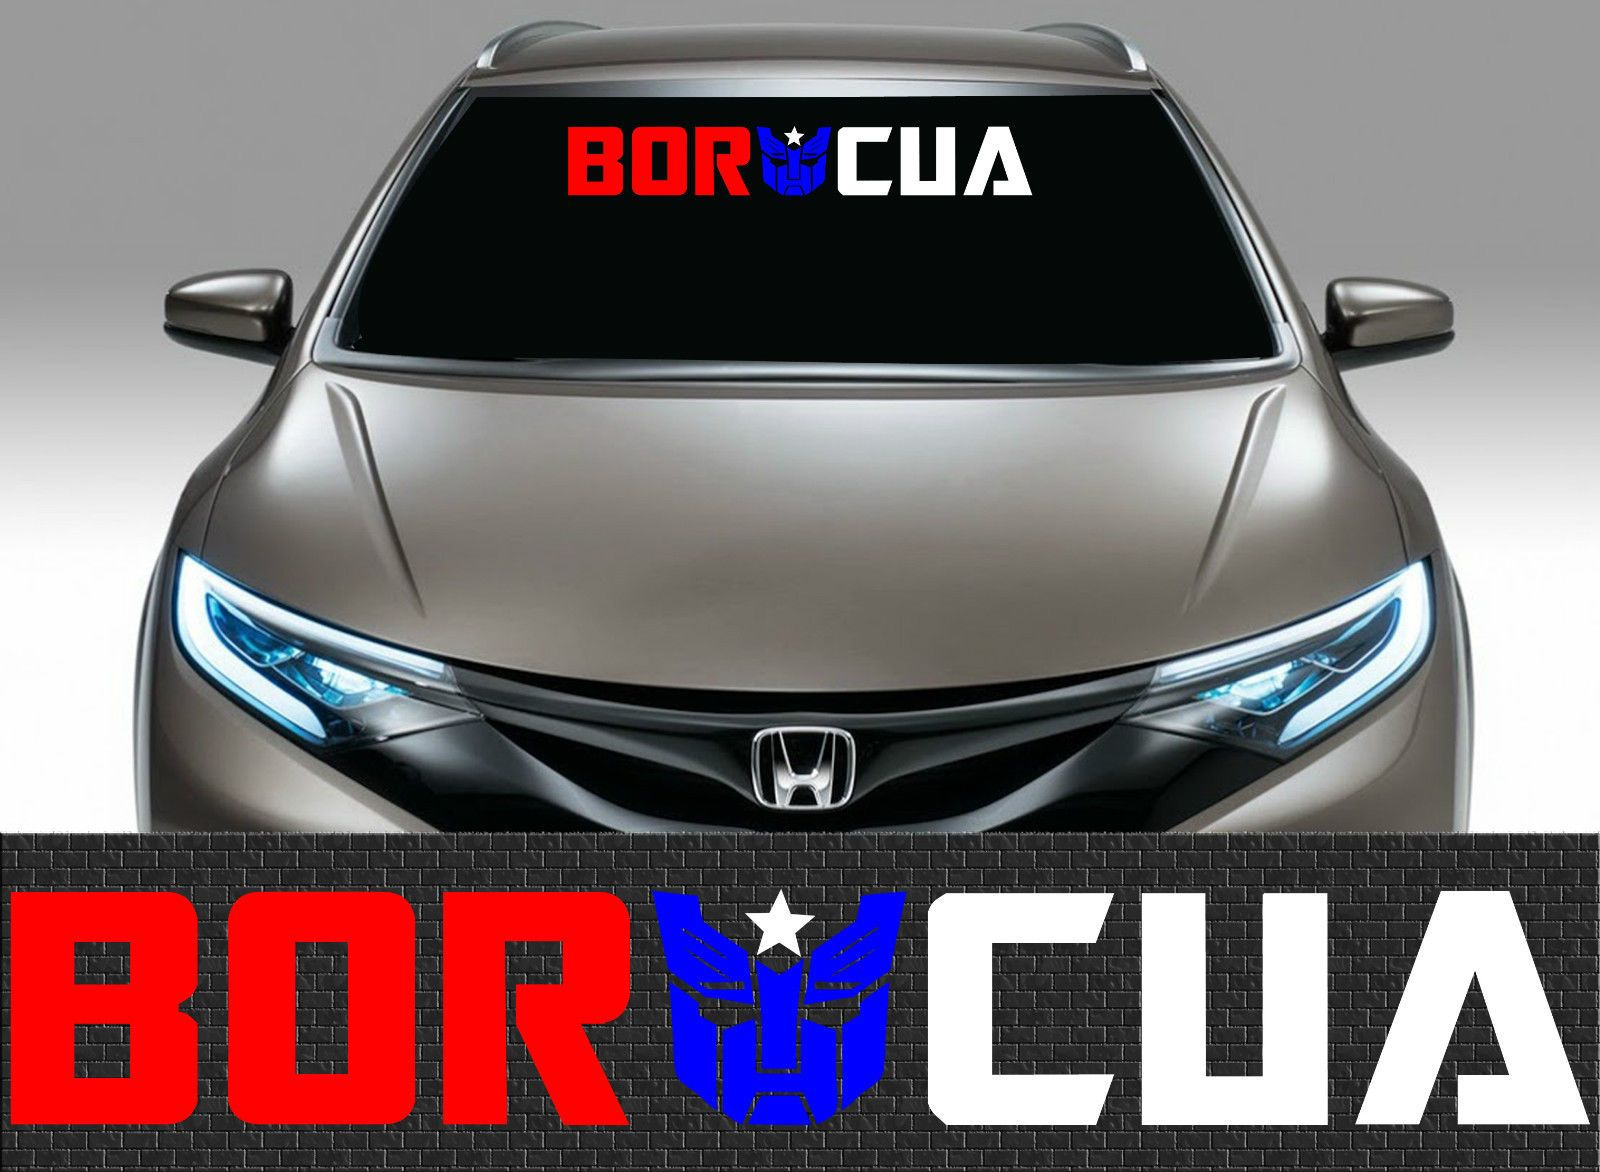 Car sticker design ebay - 1 Puerto Rico Puerto Rican Flag Car Decal Vinyl Stickers Boricua 1691 Ebay